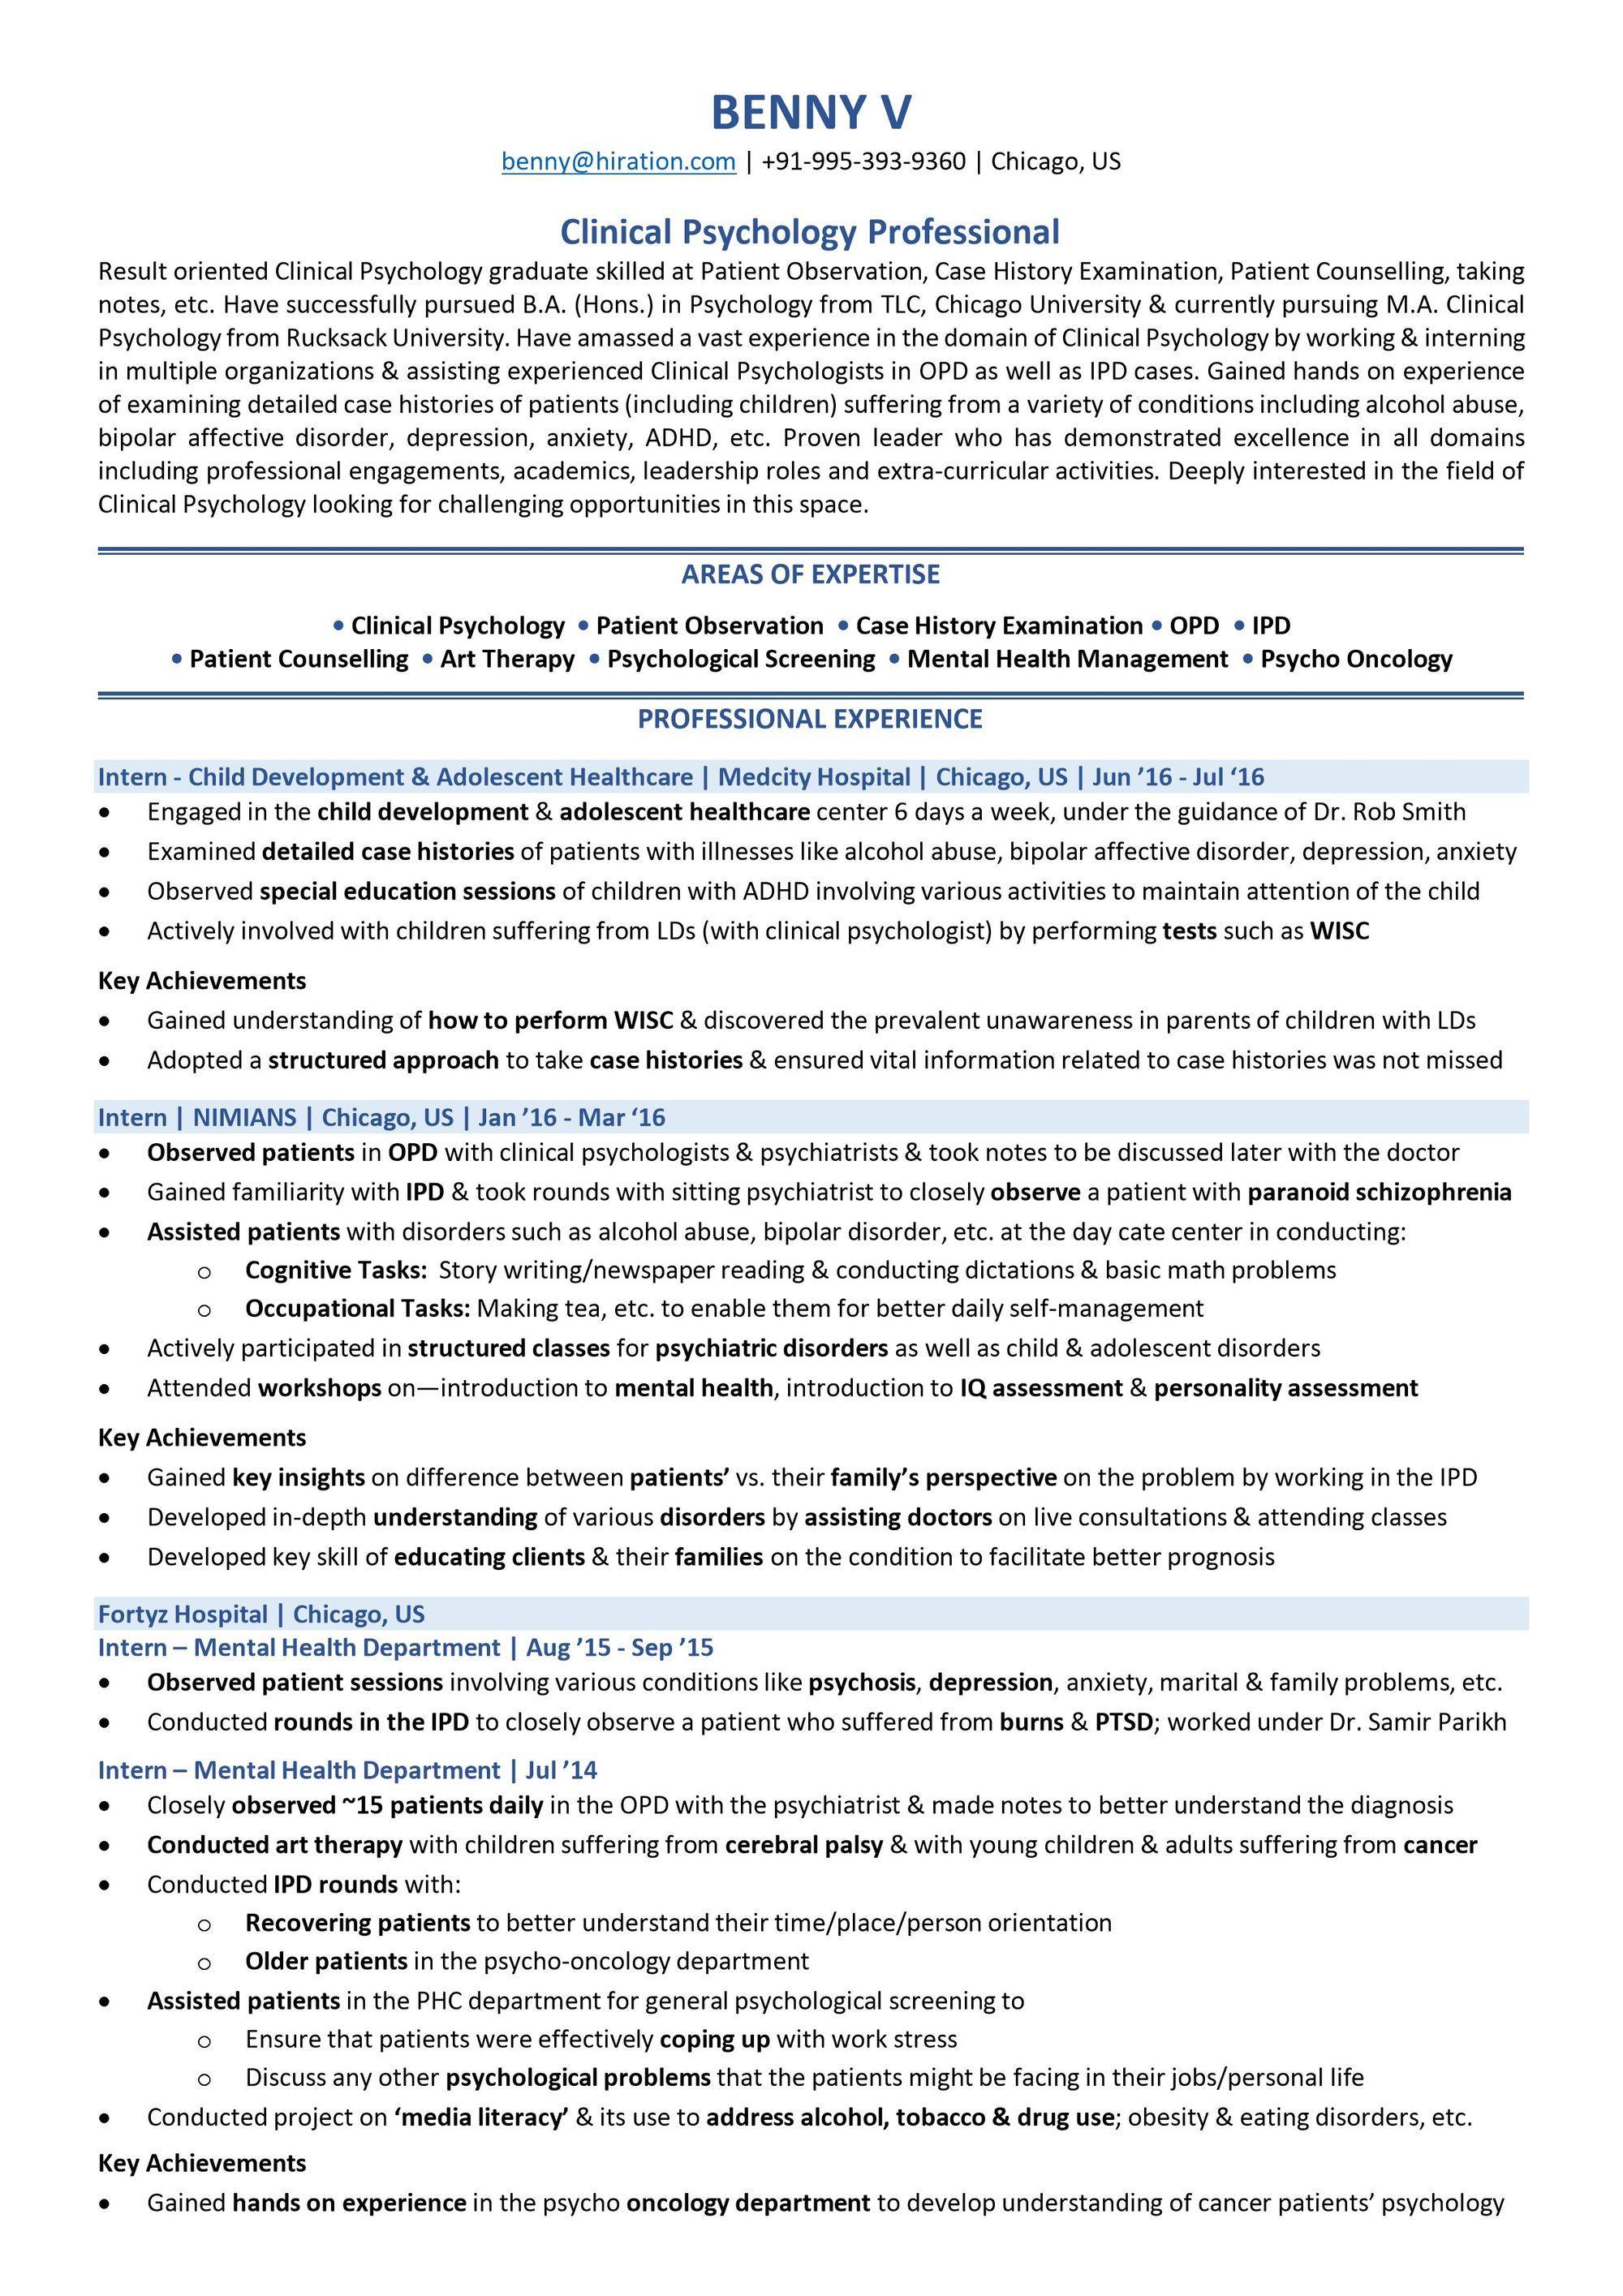 scholarship-resume-template1